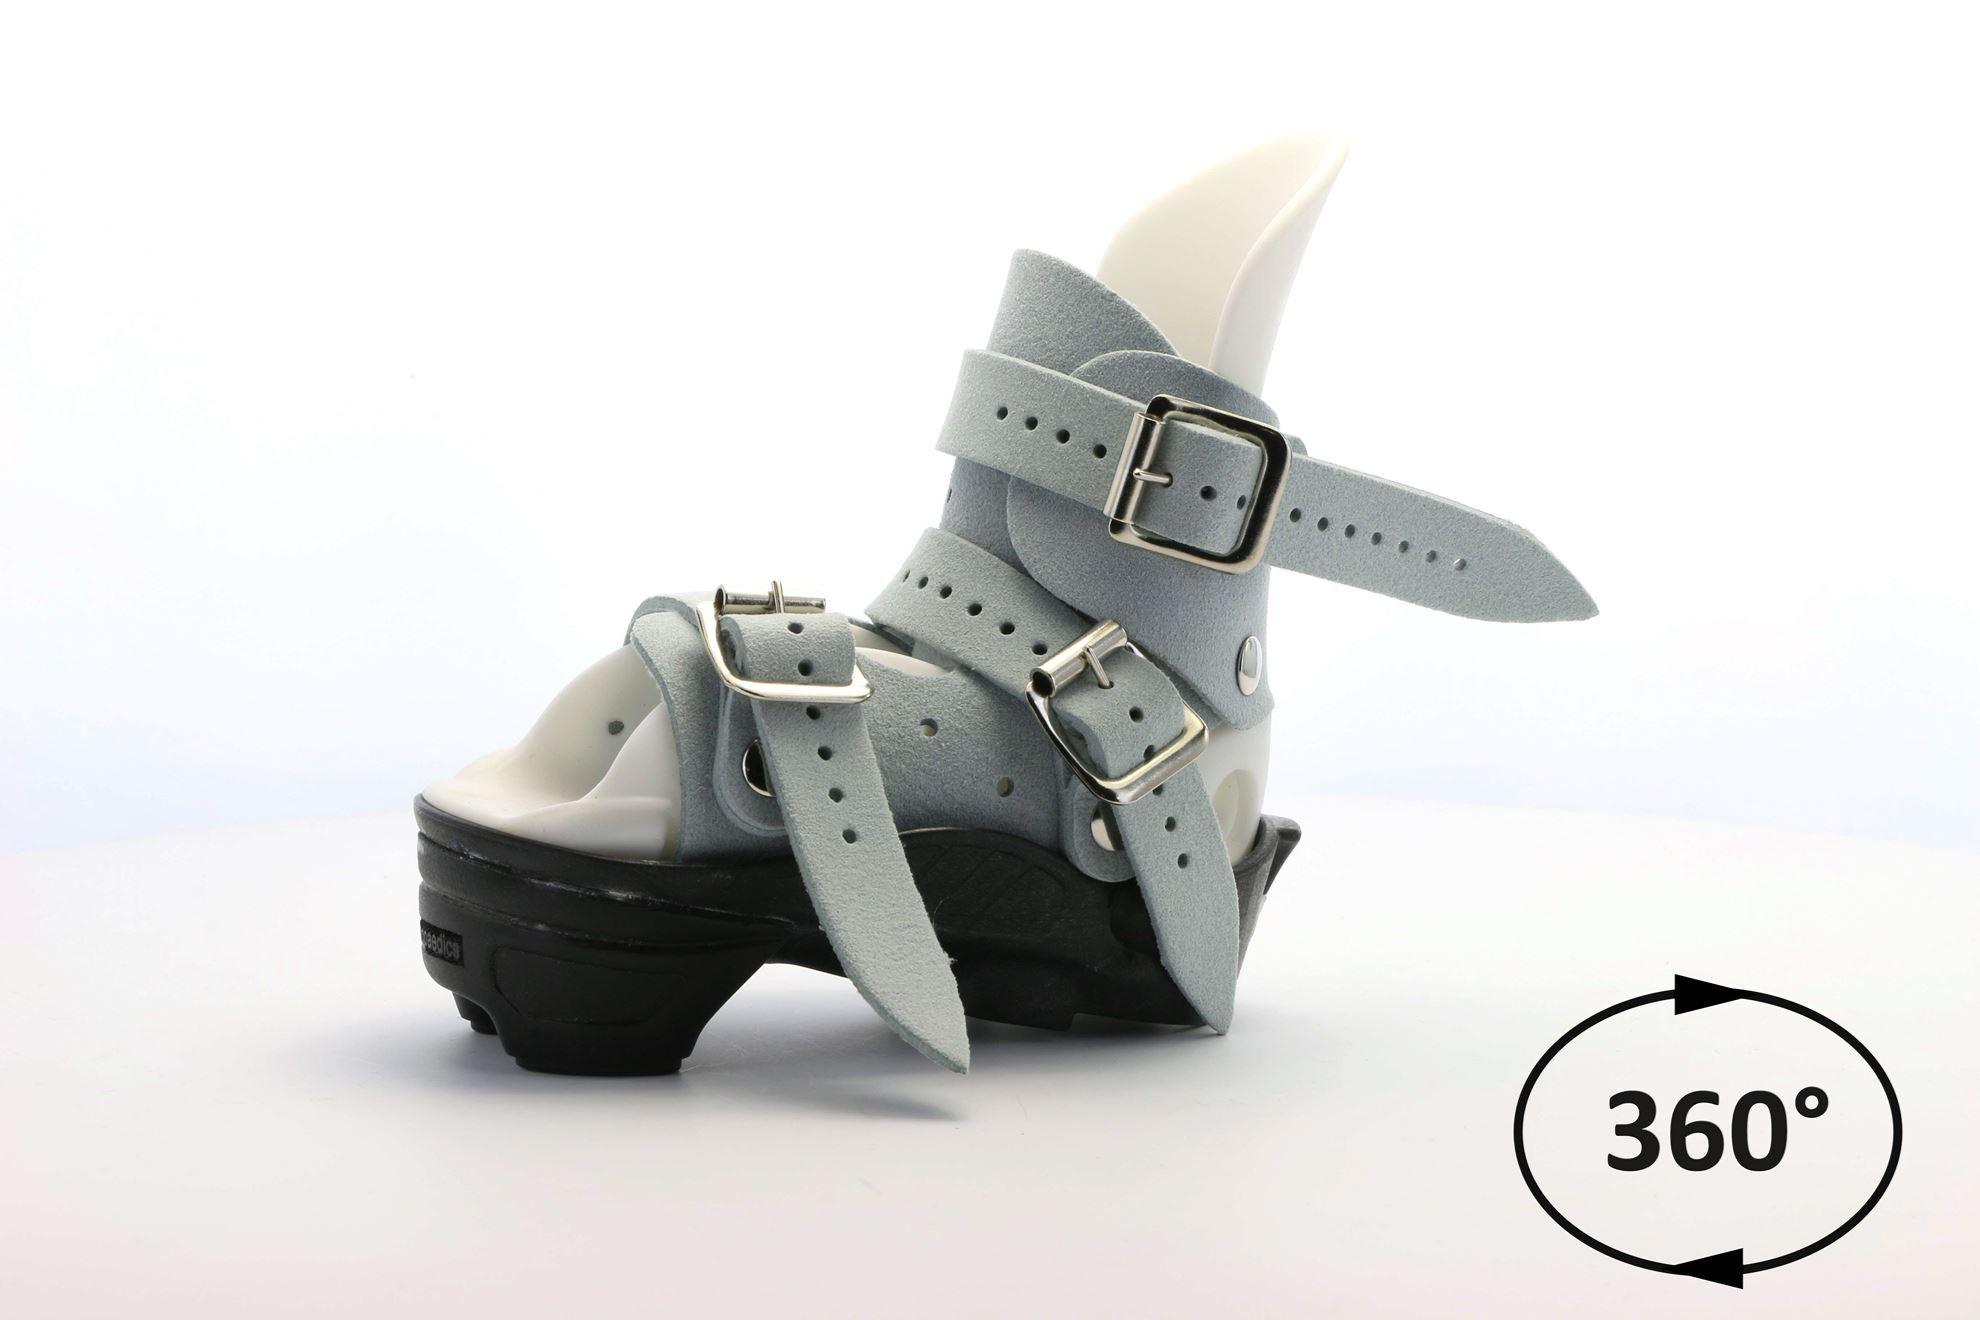 Ponseti AFO Toe Stilt Sandals - Single